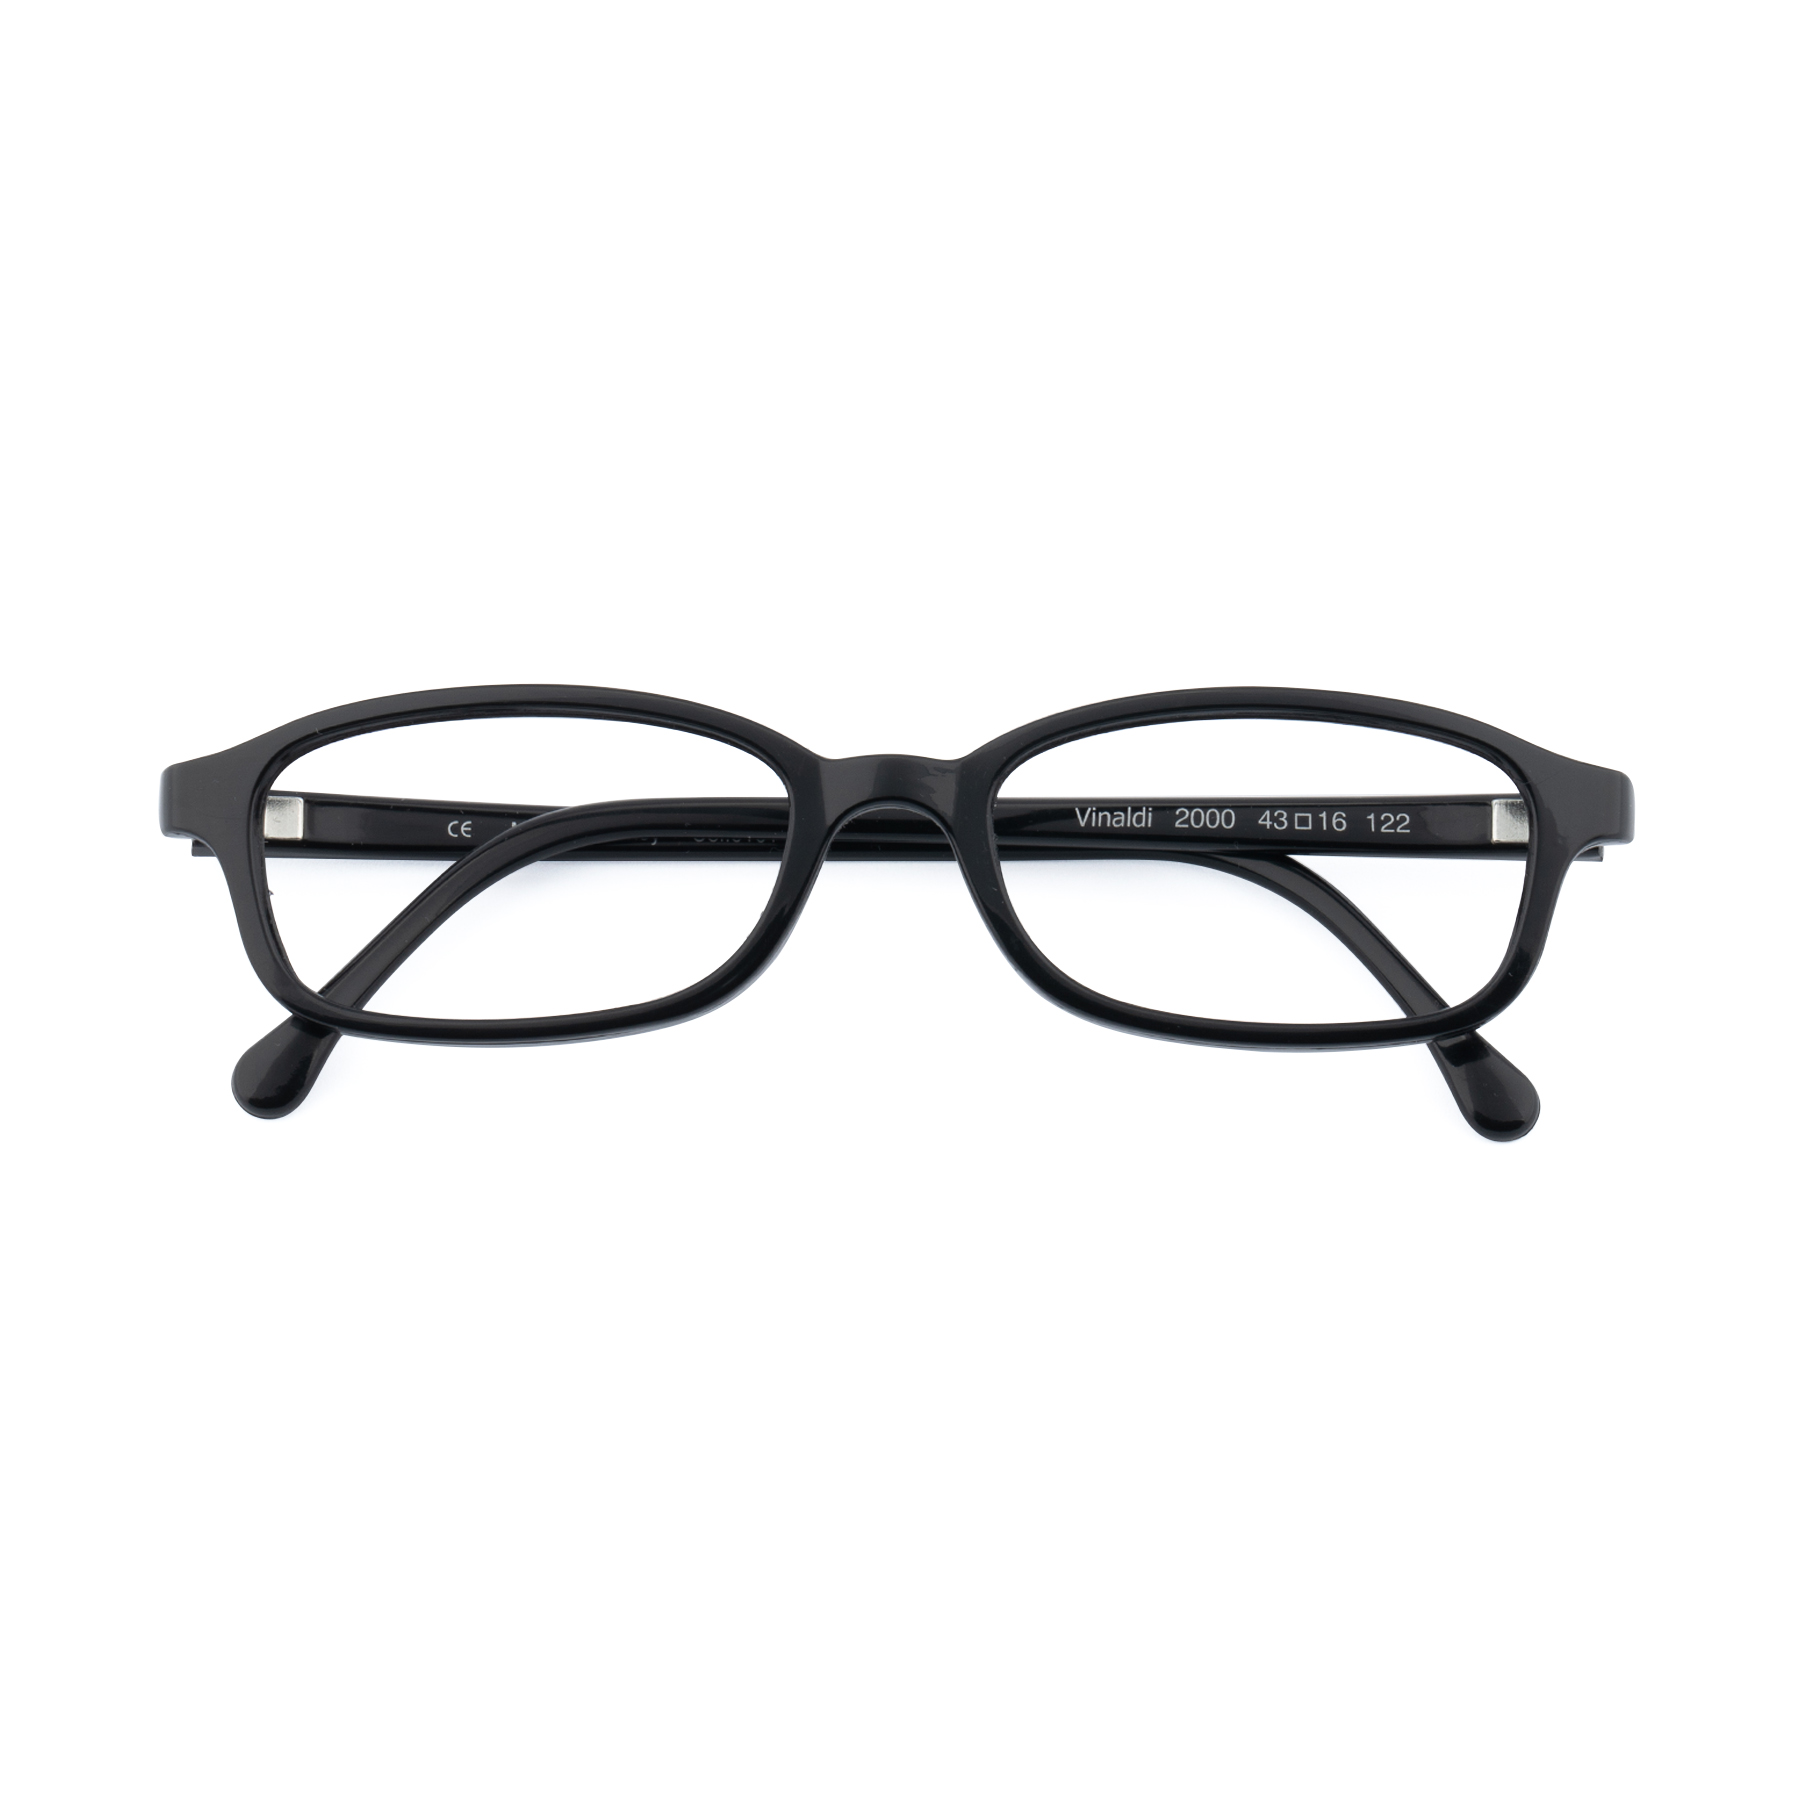 Vinaldi 2000 Eyeglass Frame